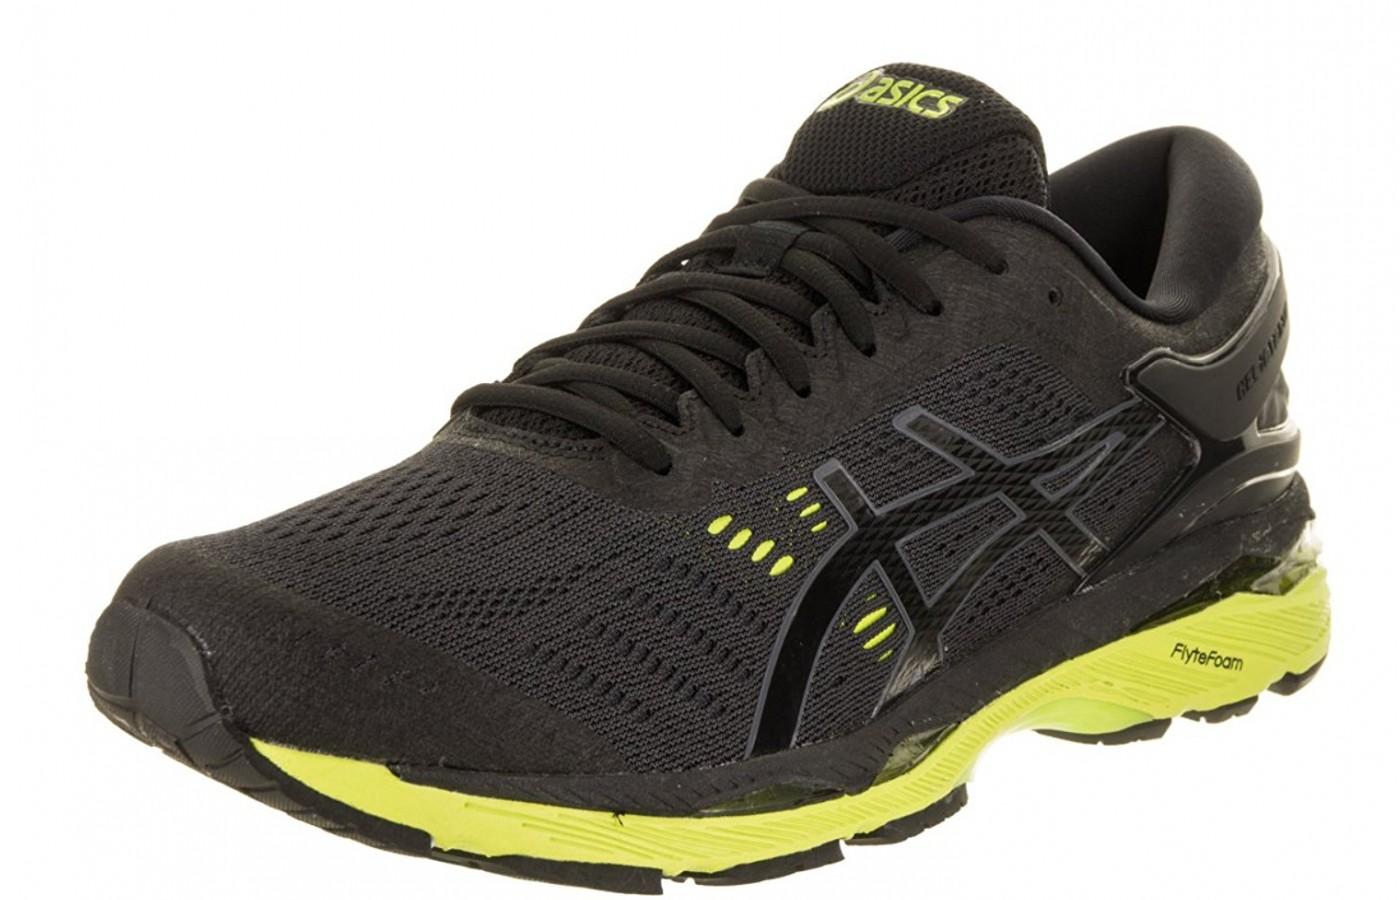 Best Asics Running Shoes For Treadmill